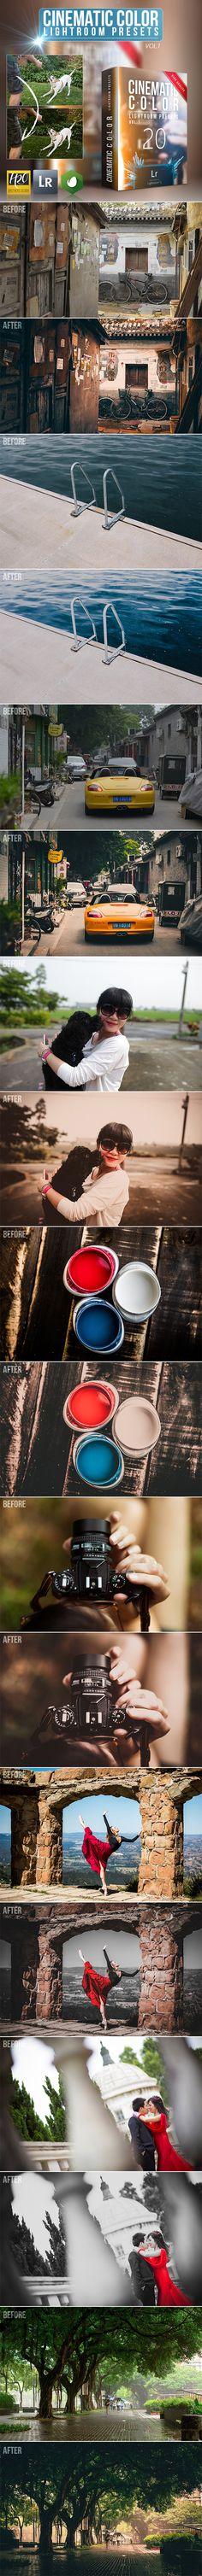 20 Cinematic Color Lightroom Presets #photography Download: http://graphicriver.net/item/20-cinematic-color-lightroom-presets/11894873?ref=ksioks